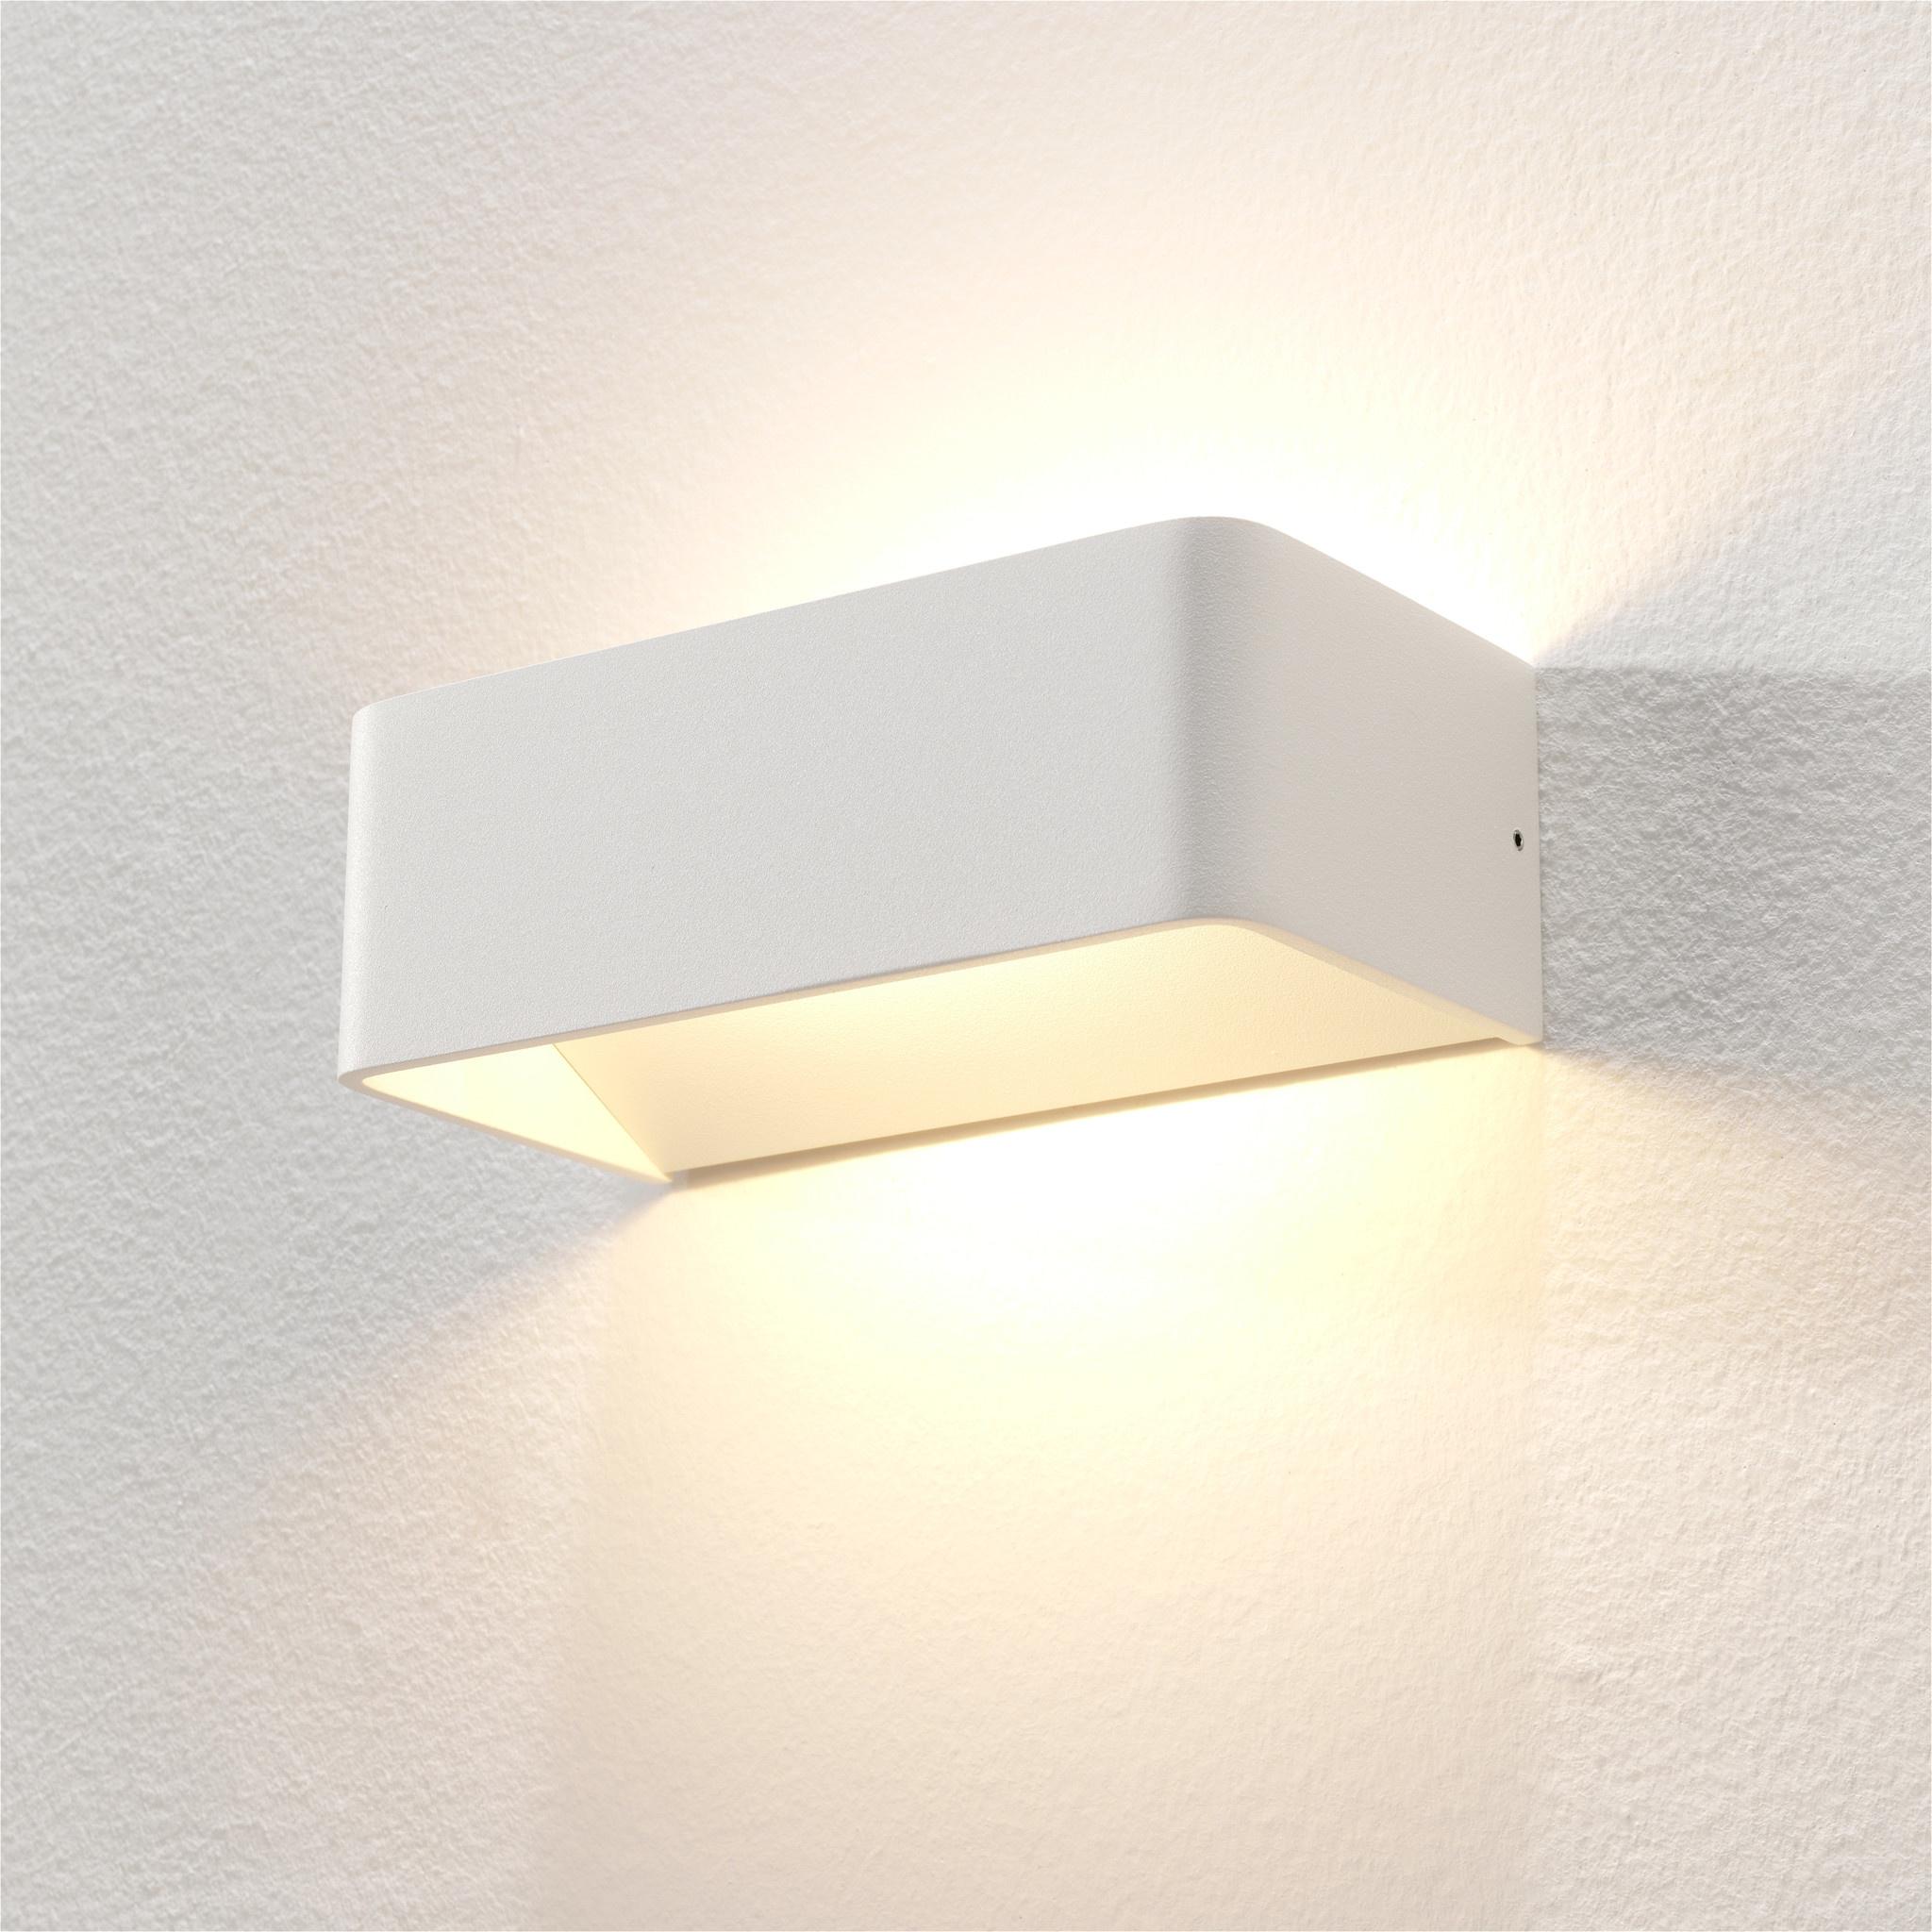 Artdelight Wandlamp Mainz 20 x 7 cm wit